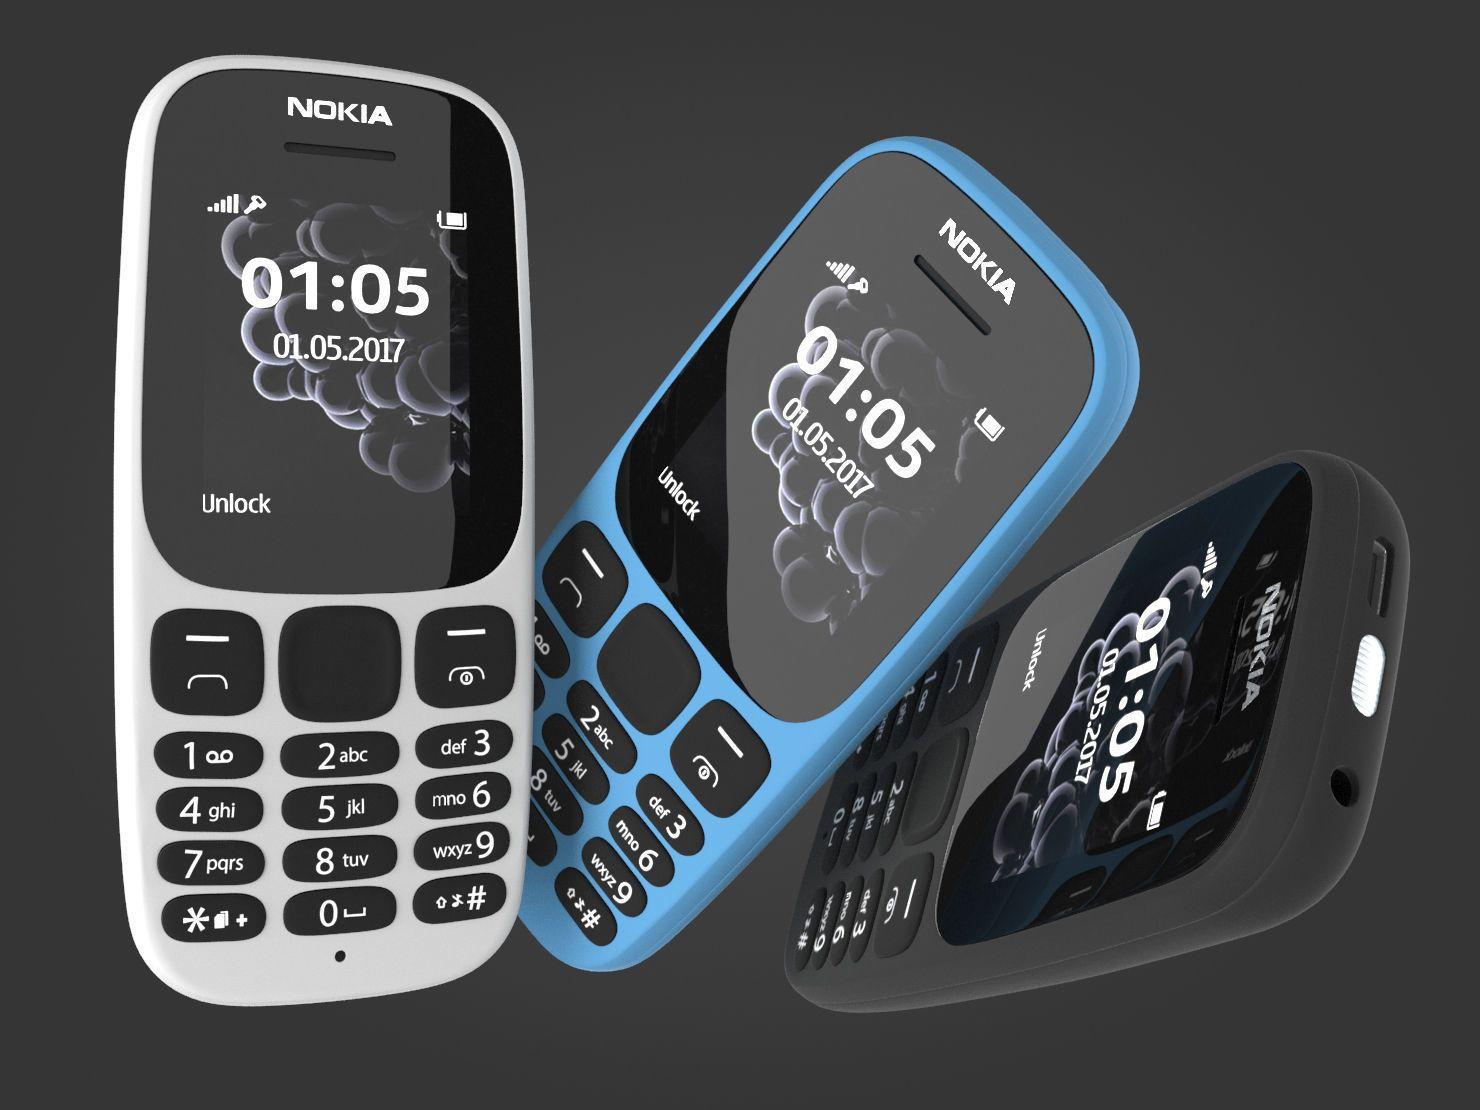 25 Superb Nokia Phone Sprint Nokia Phone Factory Unlocked